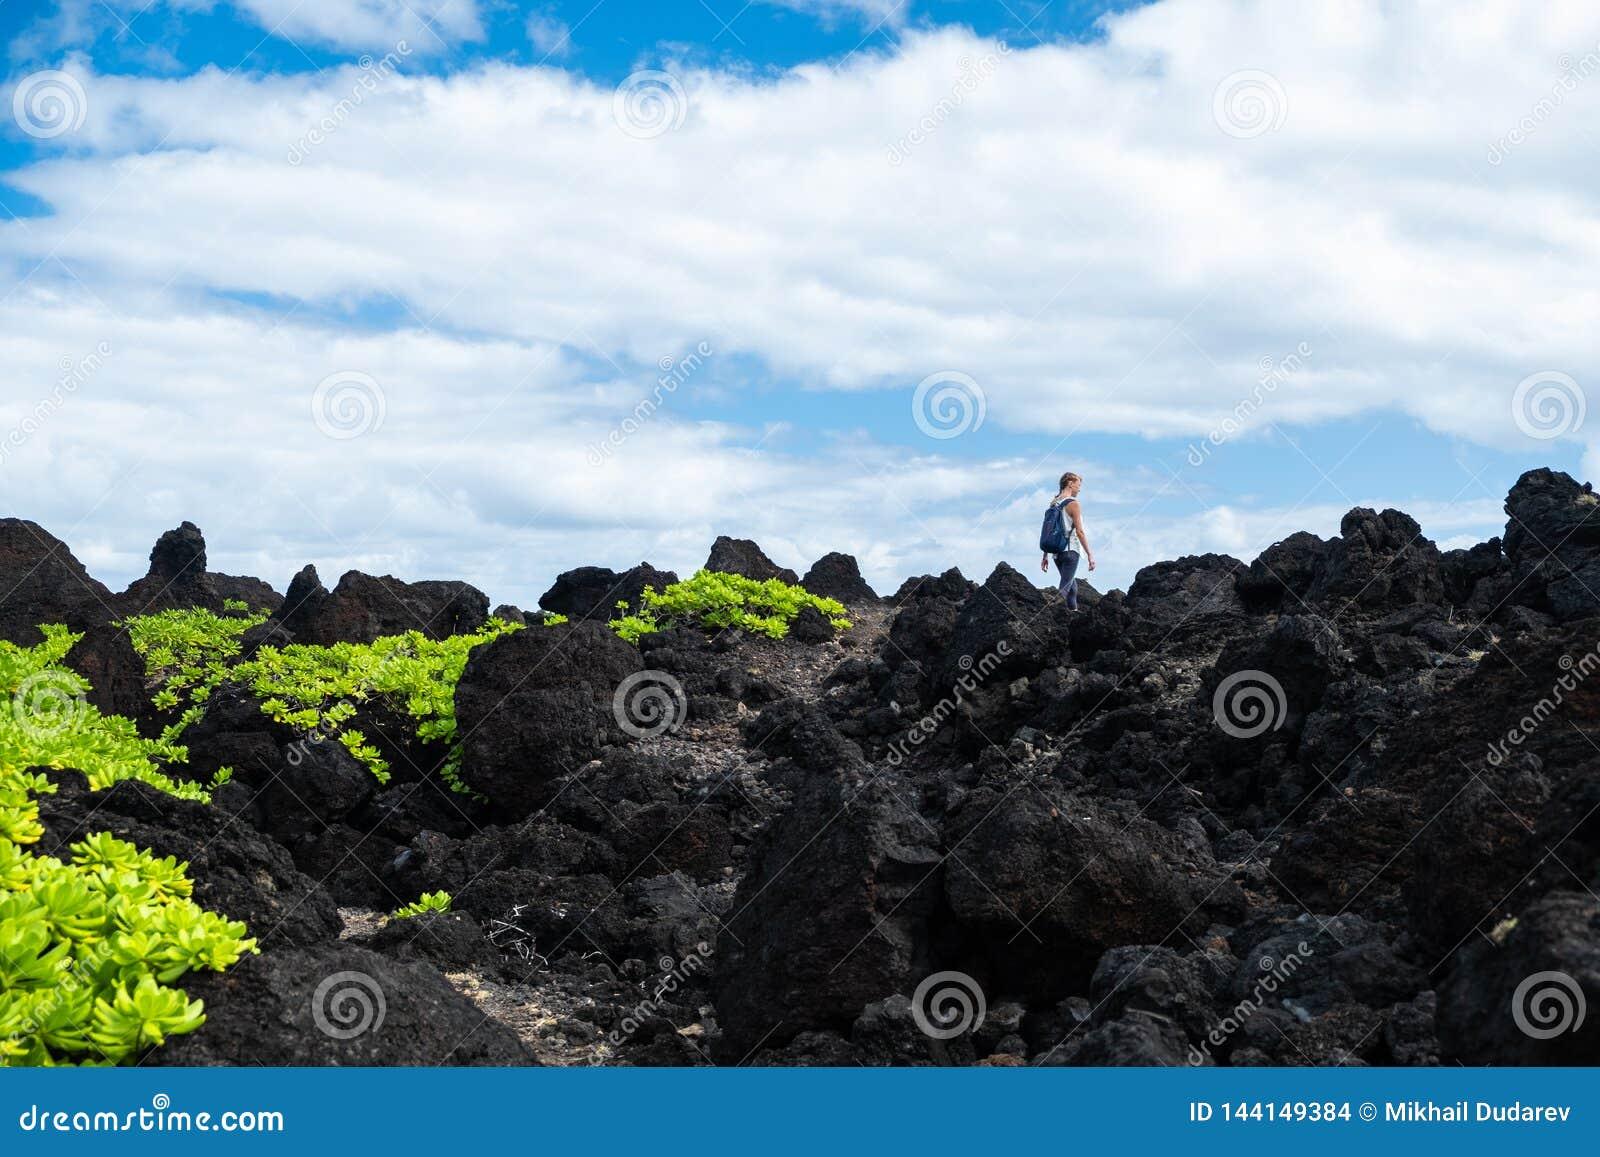 Woman hiker walks on the sharp volcanic land